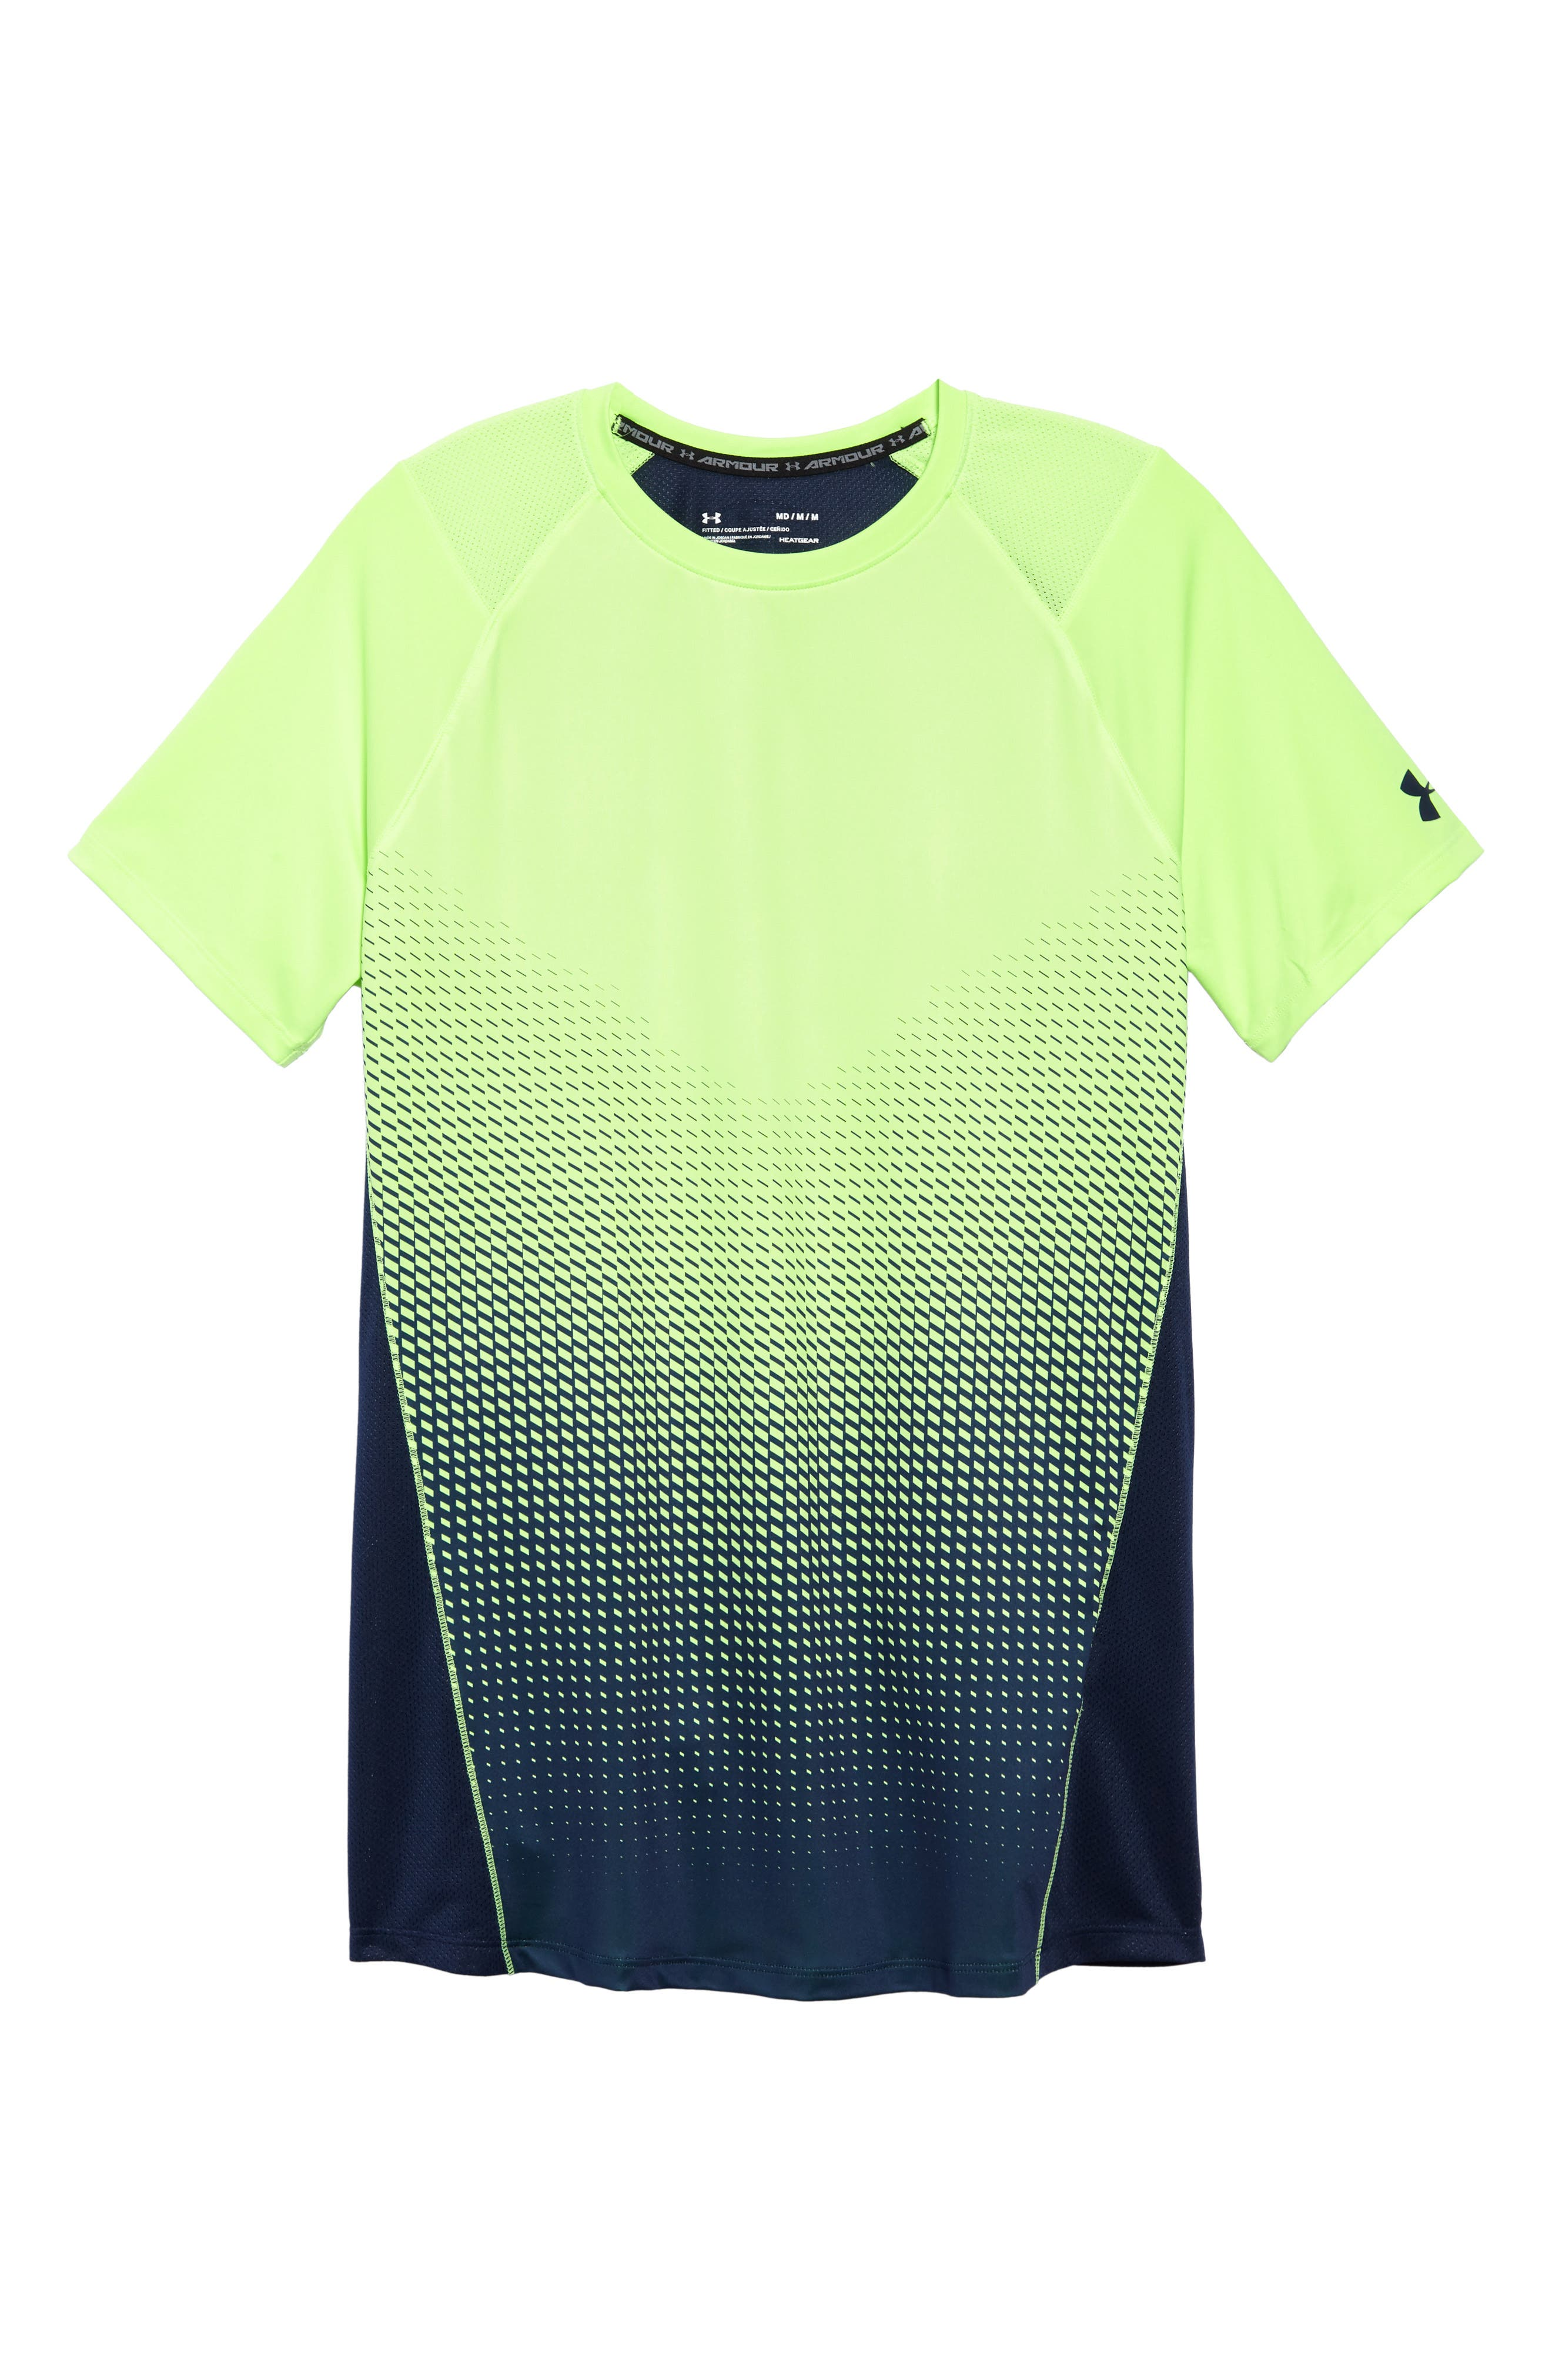 MK1 Dash Crewneck T-Shirt,                             Alternate thumbnail 6, color,                             Lime / Academy / Graphite